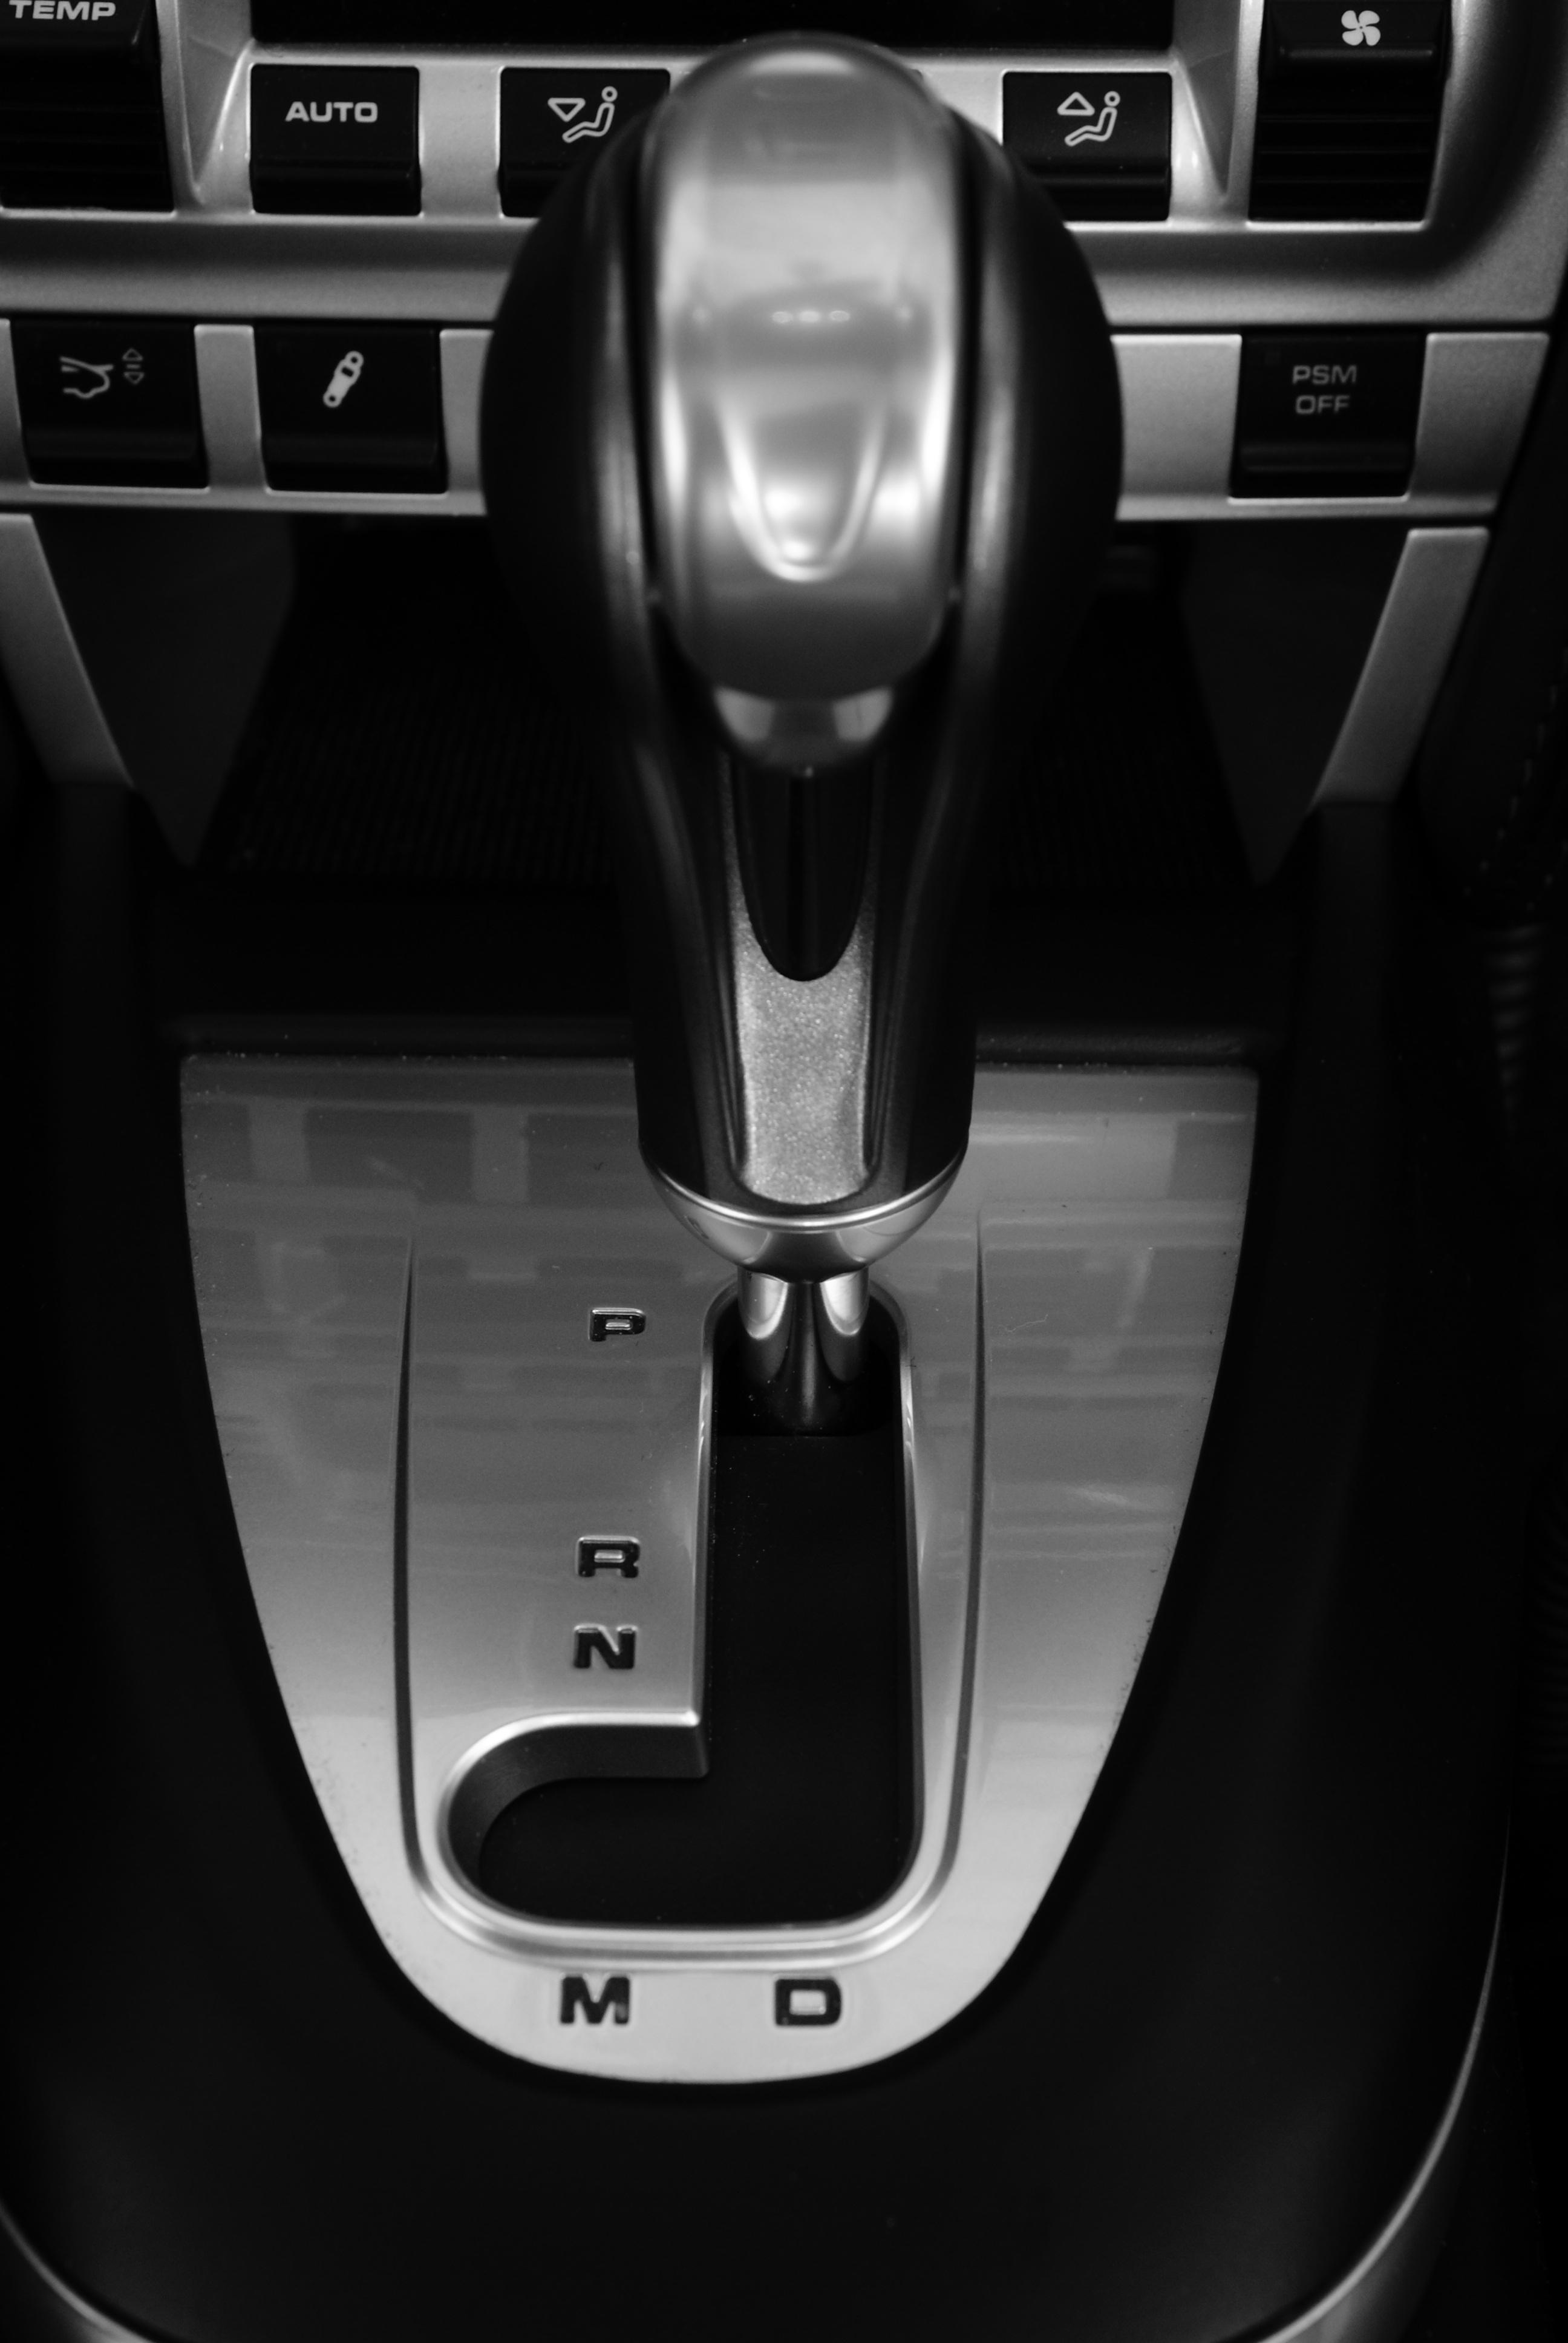 file porsche 911 997 targa gearbox wikimedia commons. Black Bedroom Furniture Sets. Home Design Ideas